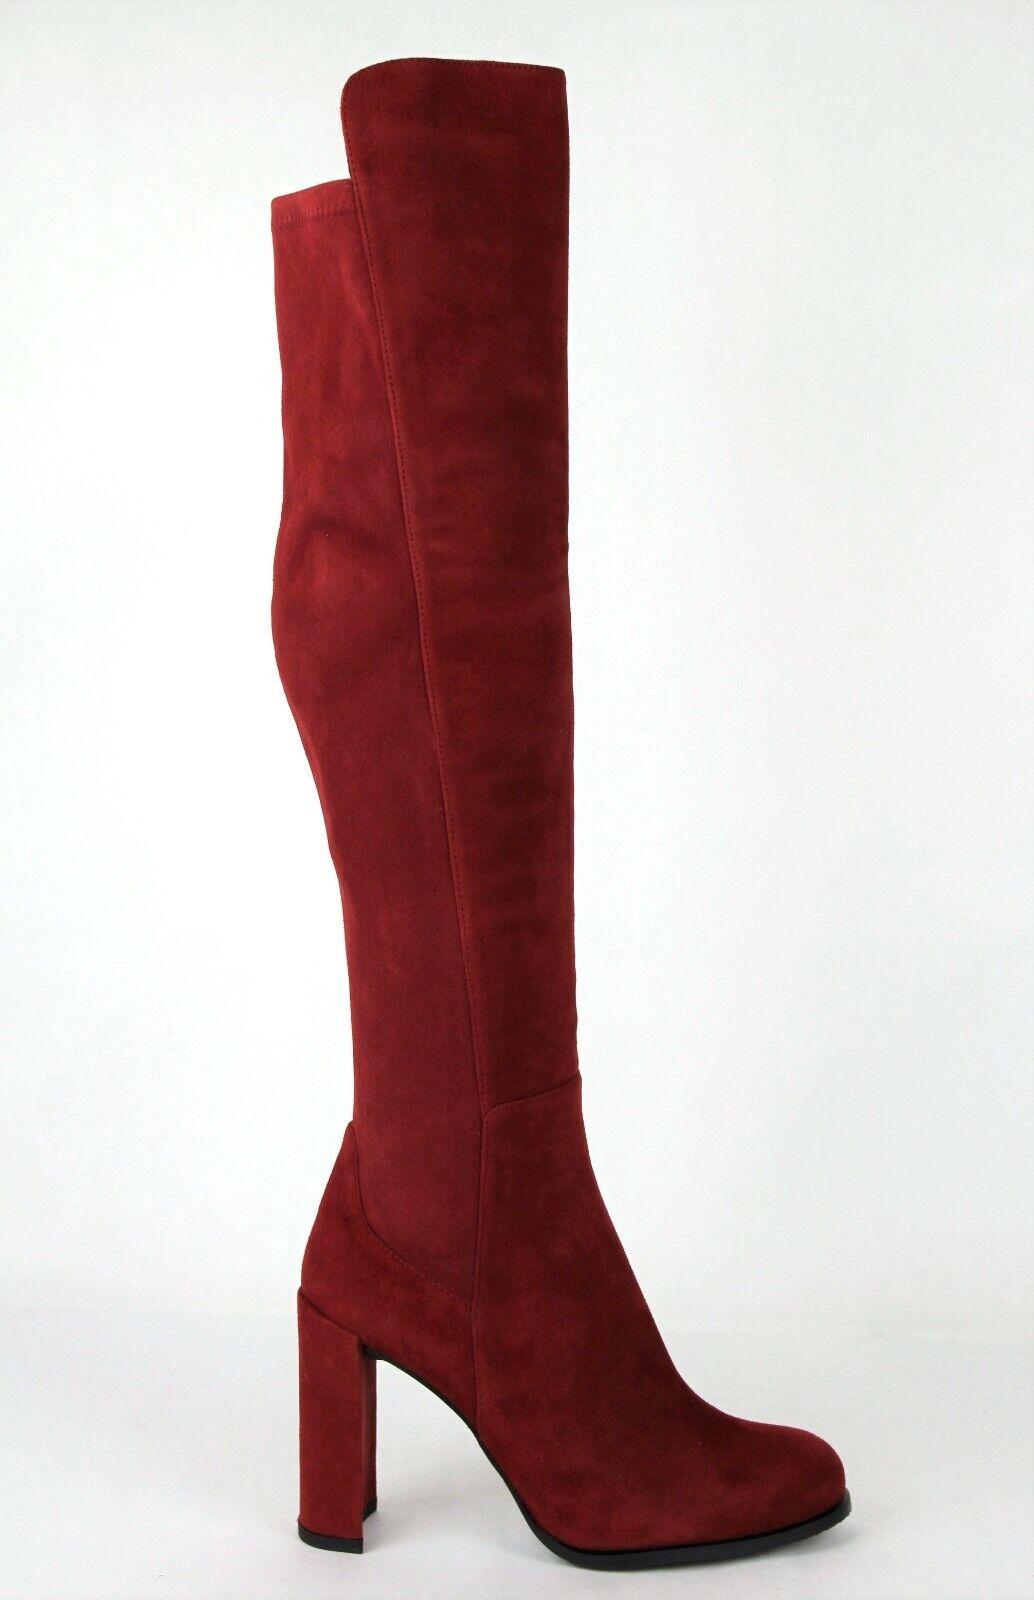 765 Stuart Weitzman Women's Alljill Scarlet Red Suede Over-the-knee Boot